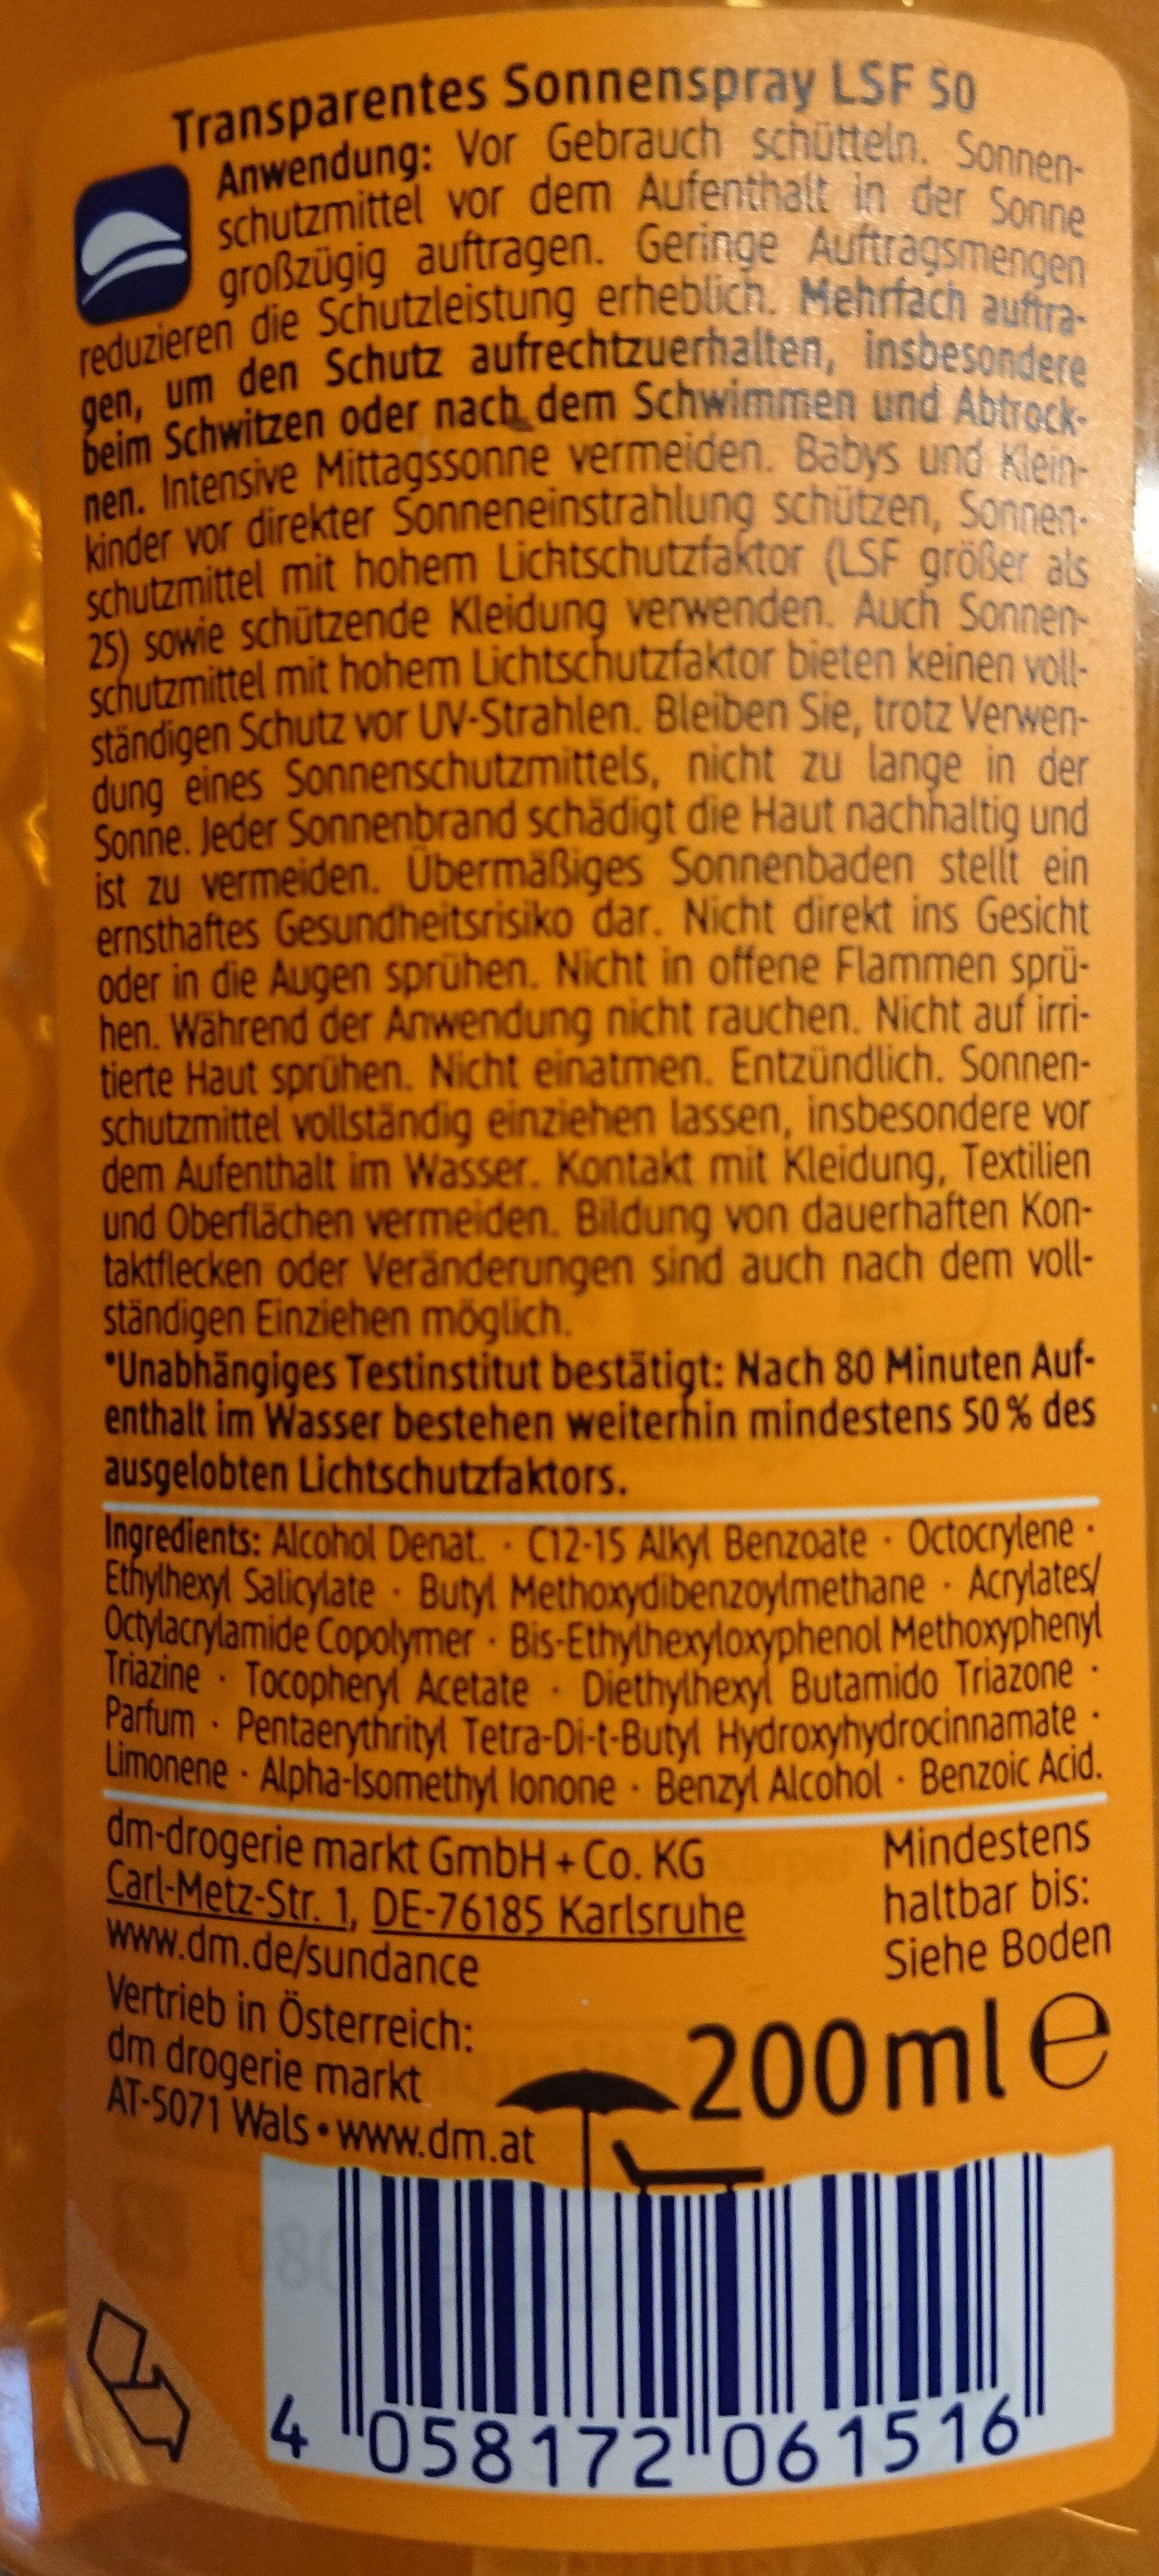 Transparentes Sonnenspray LSF 50 - Product - en